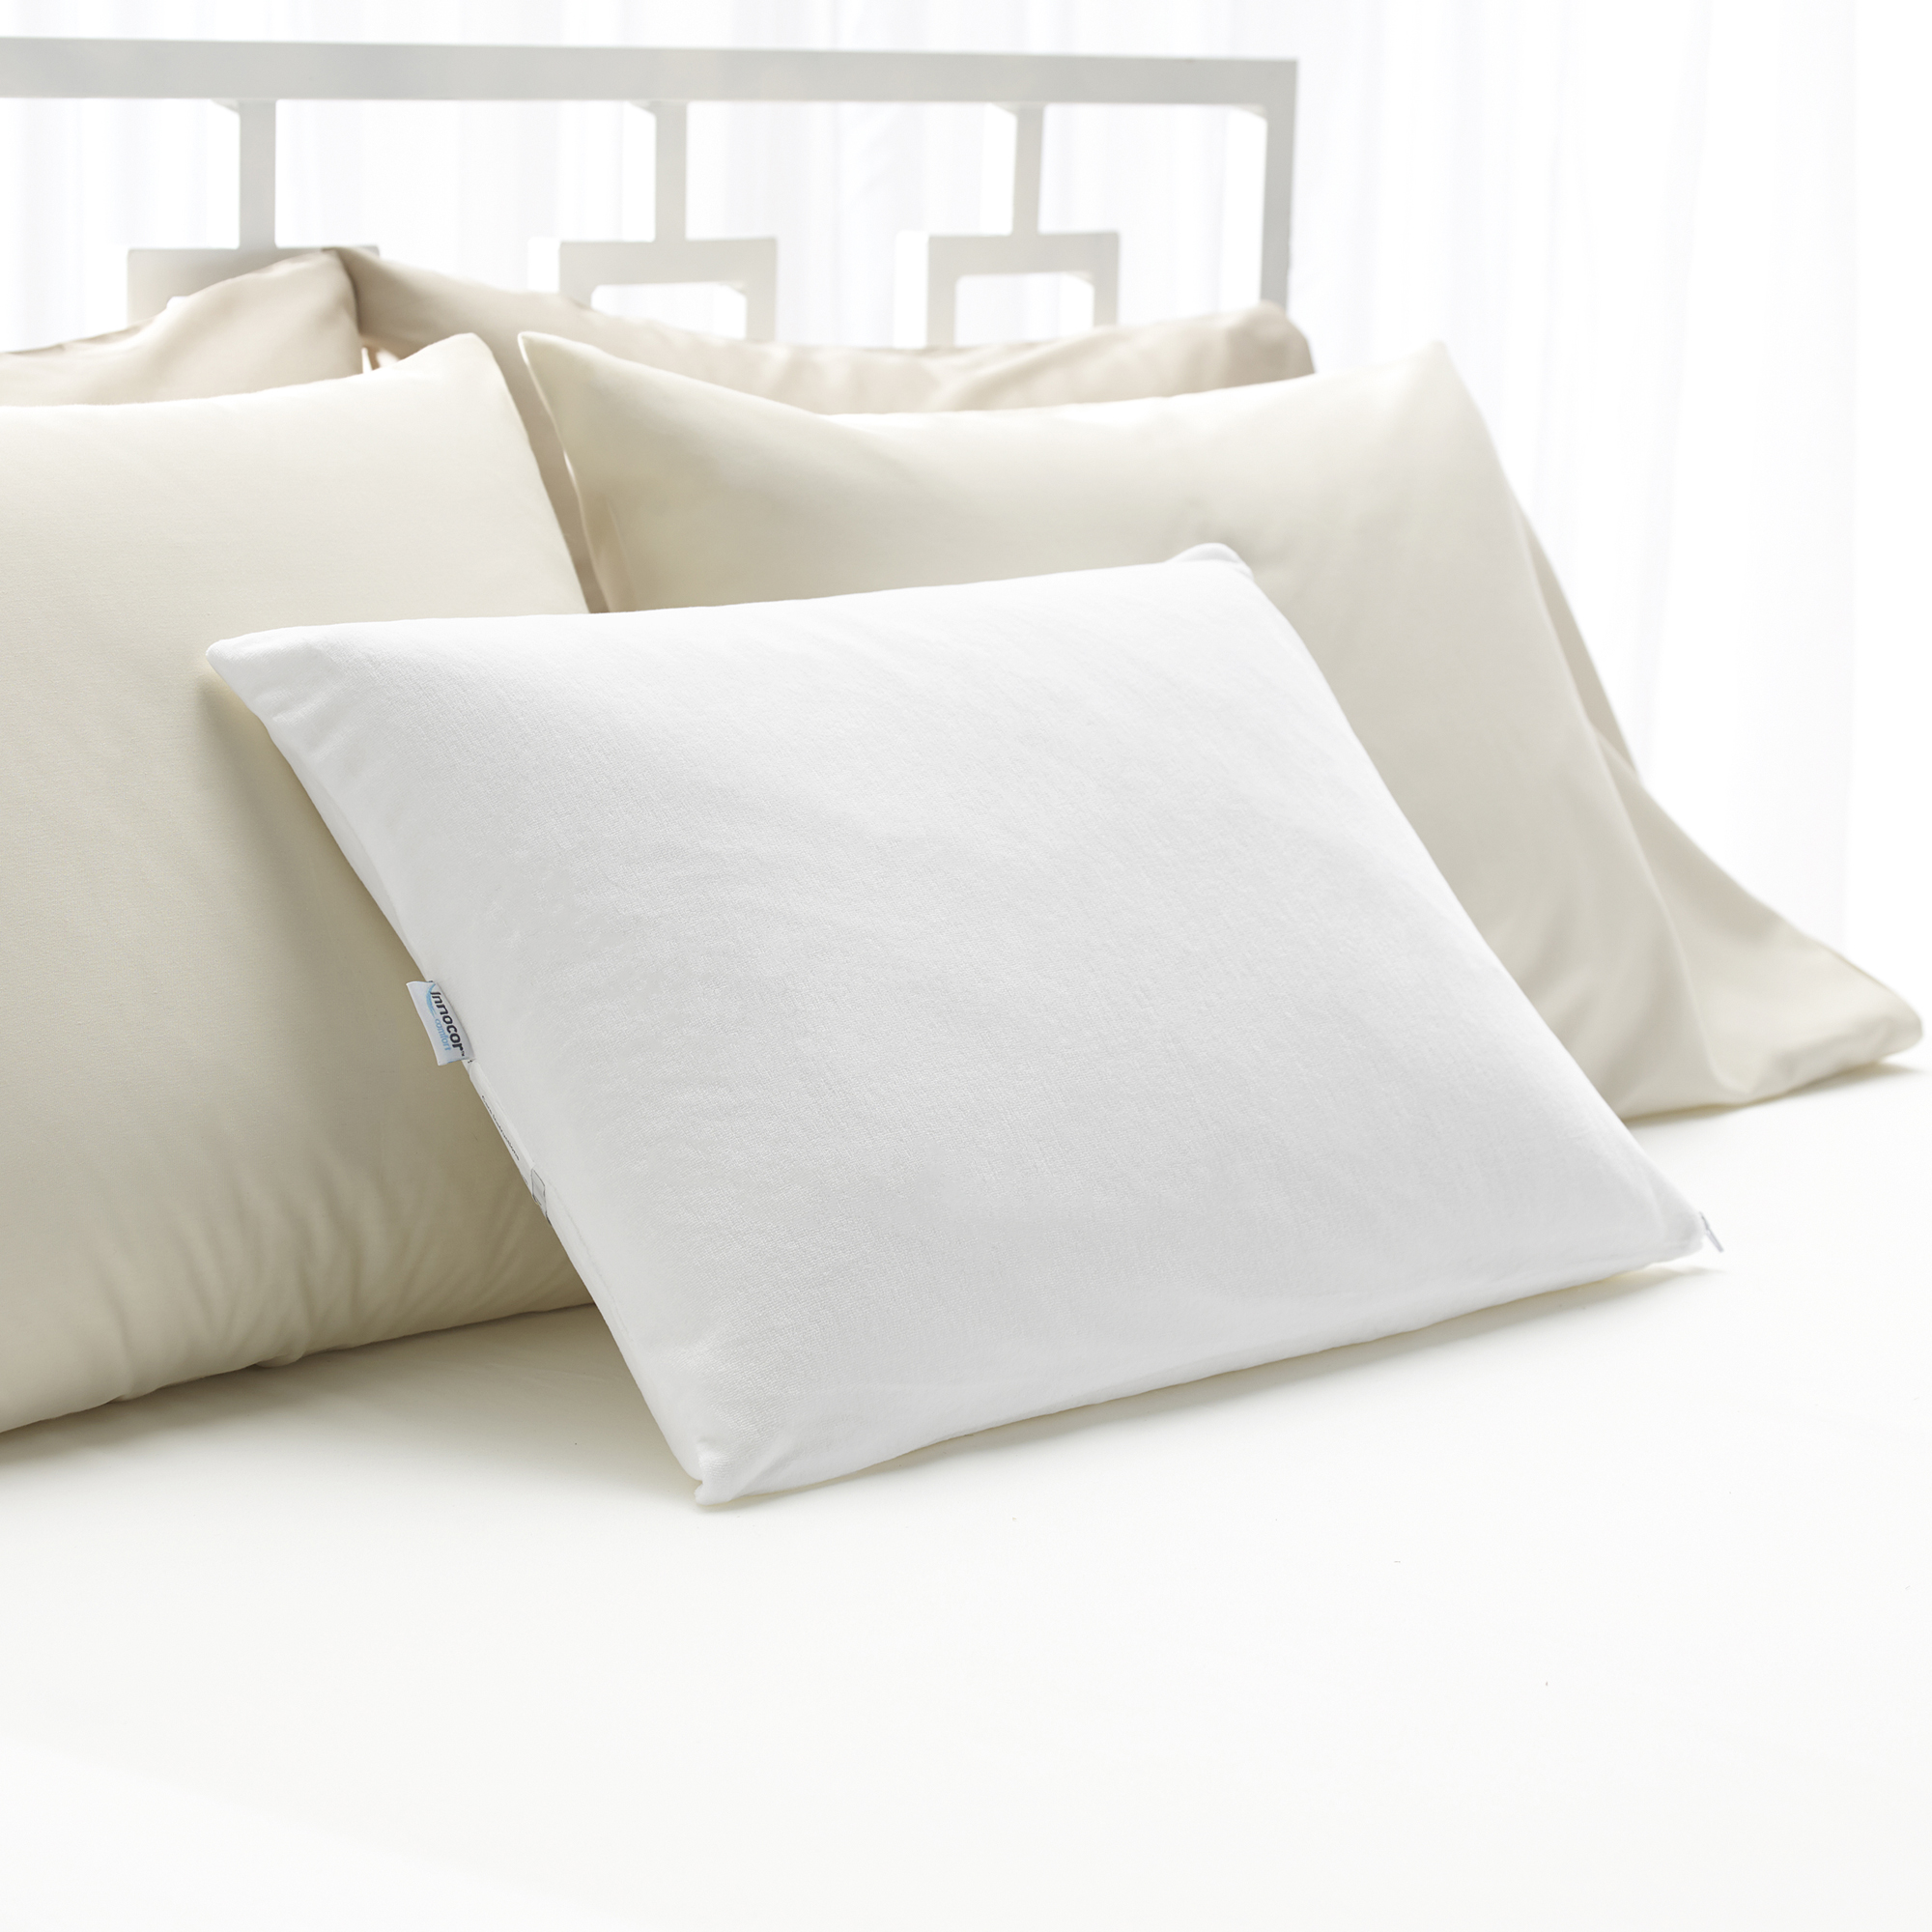 Pillow 120 Gsm Micro Polyester Shell Comfort Home Linen